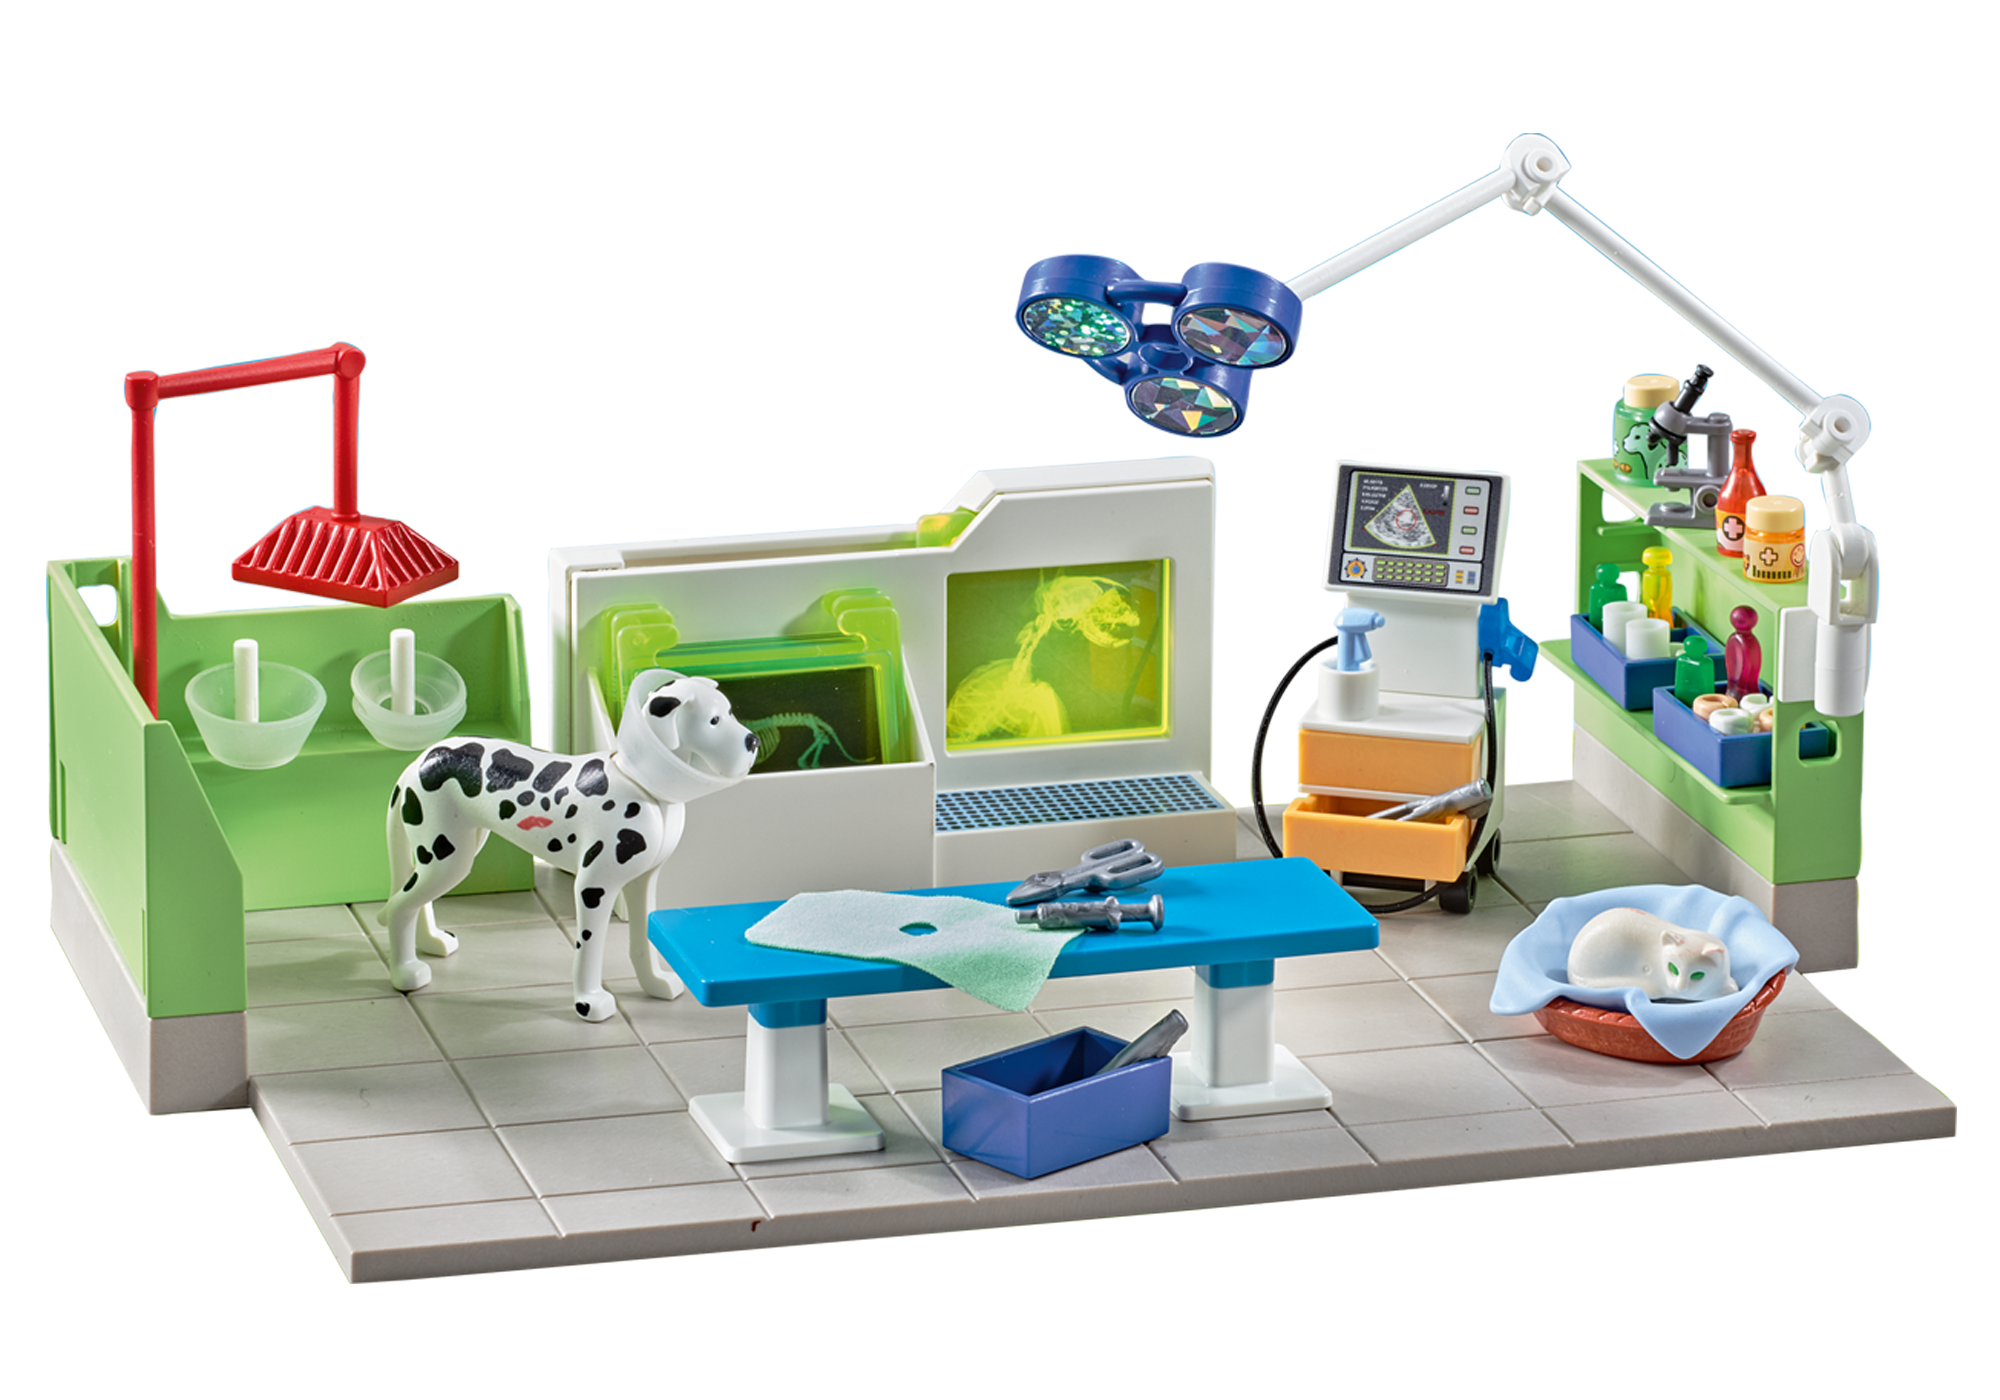 http://media.playmobil.com/i/playmobil/9816_product_detail/Tierarztpraxis mit Röntgengerät